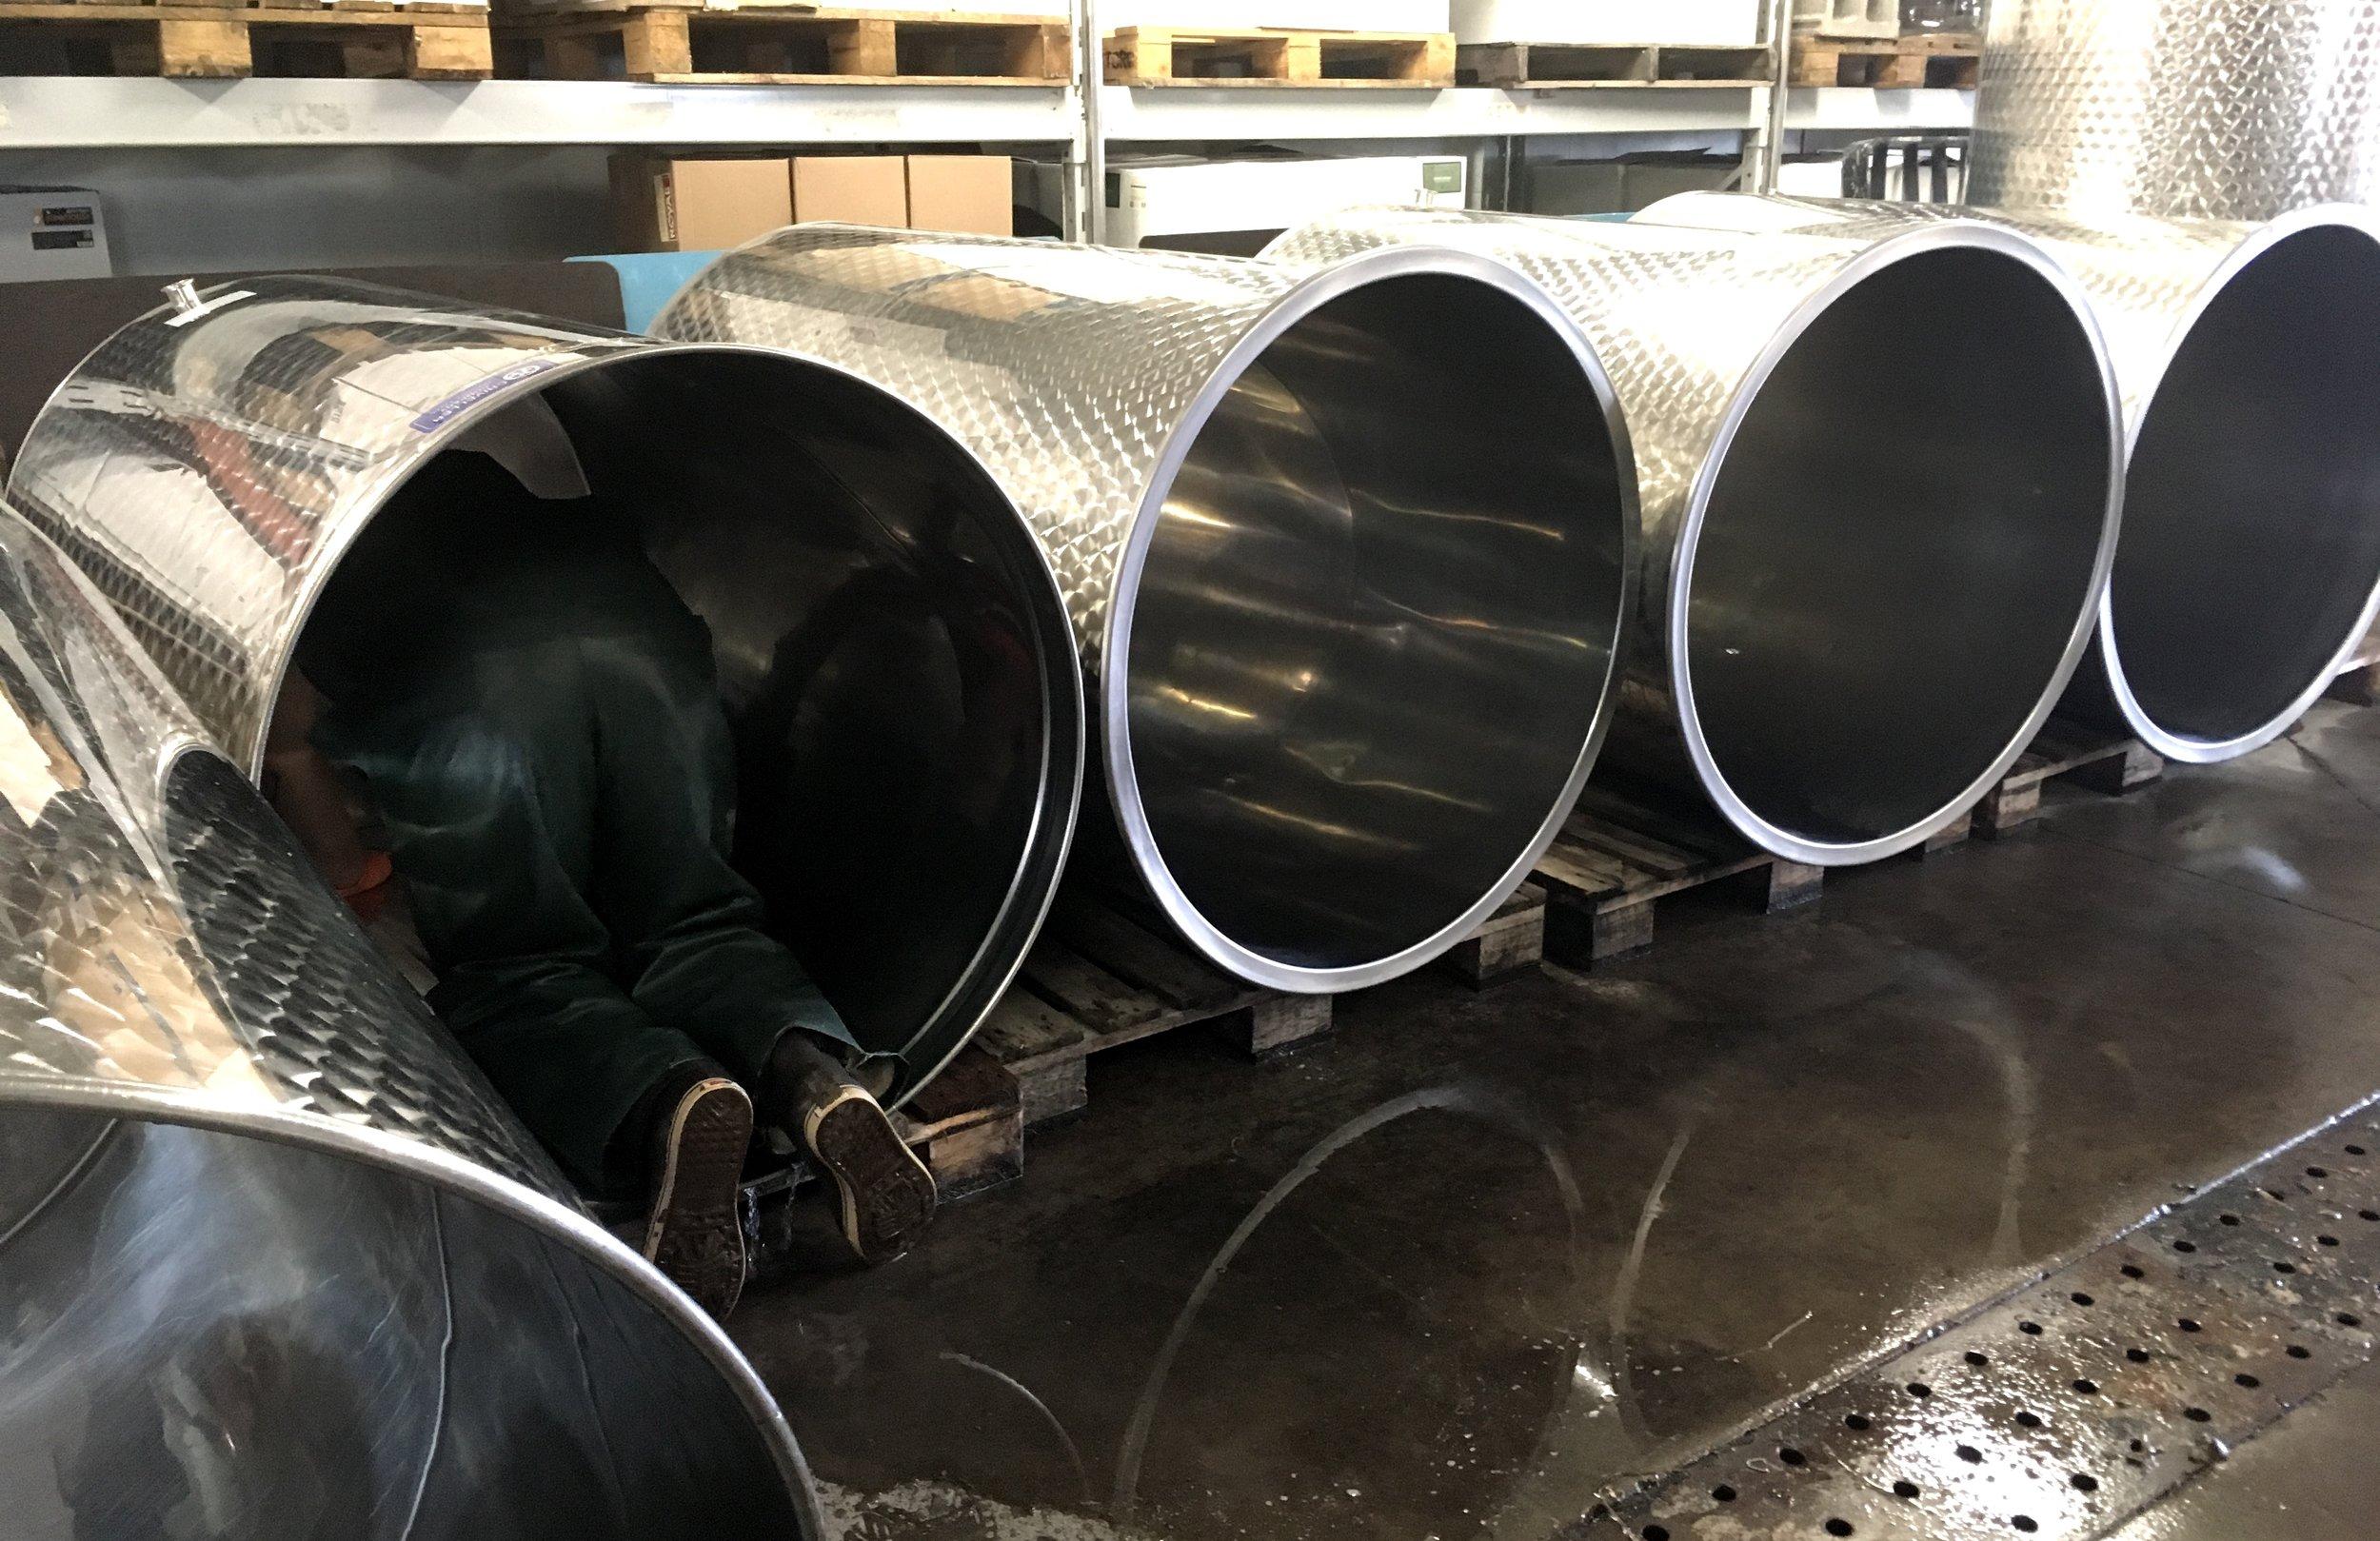 tank cleaning 2017.jpg